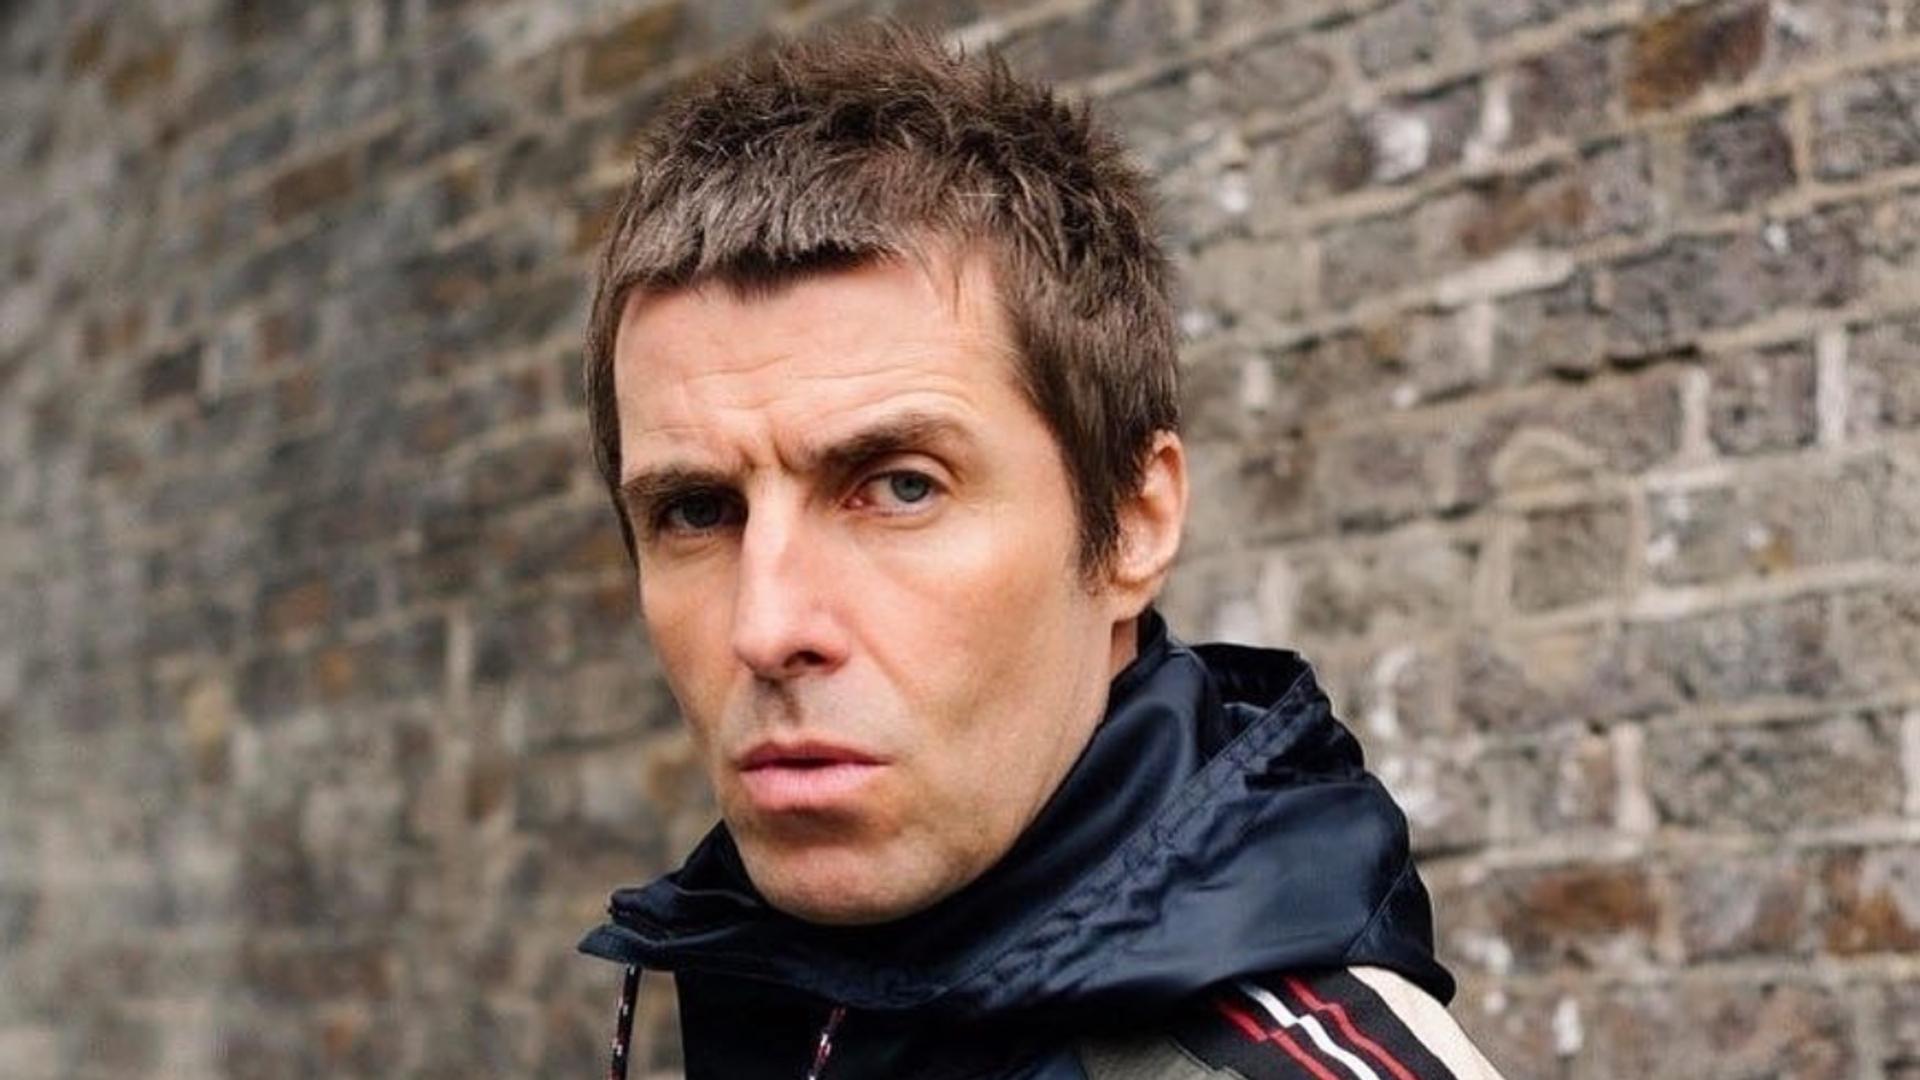 Liam Gallagher, rockero británico (foto de archivo) - Sputnik Mundo, 1920, 19.09.2021